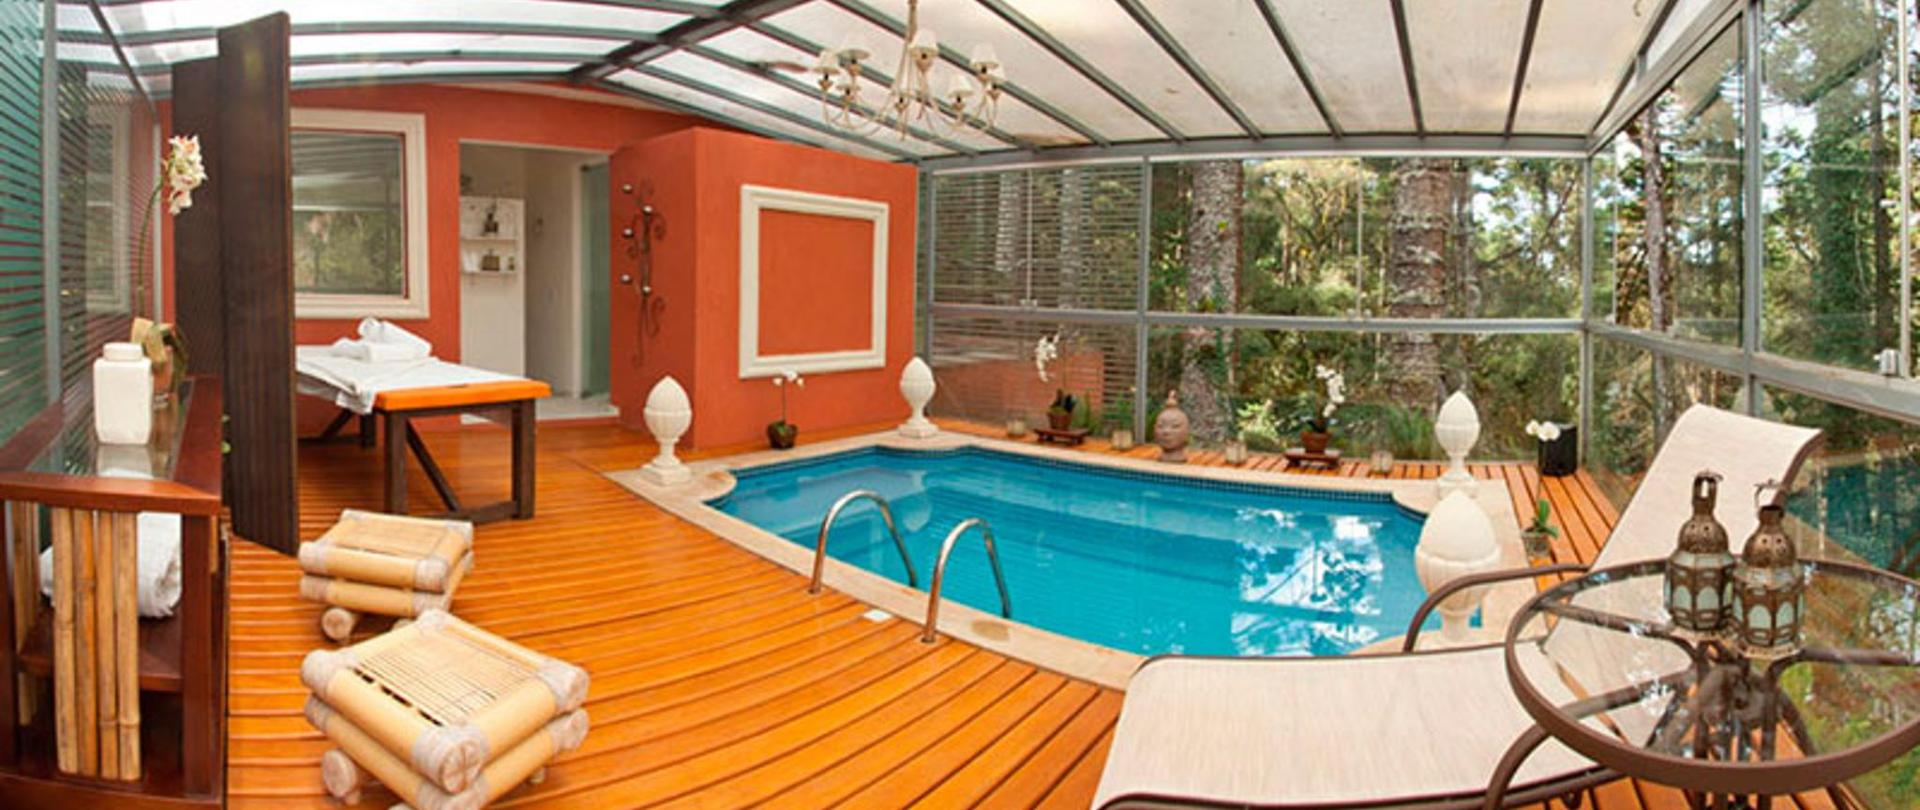 pousada-de-luxo-em-campos-do-jordao-villa-casato-hidro-sauna3G.jpg